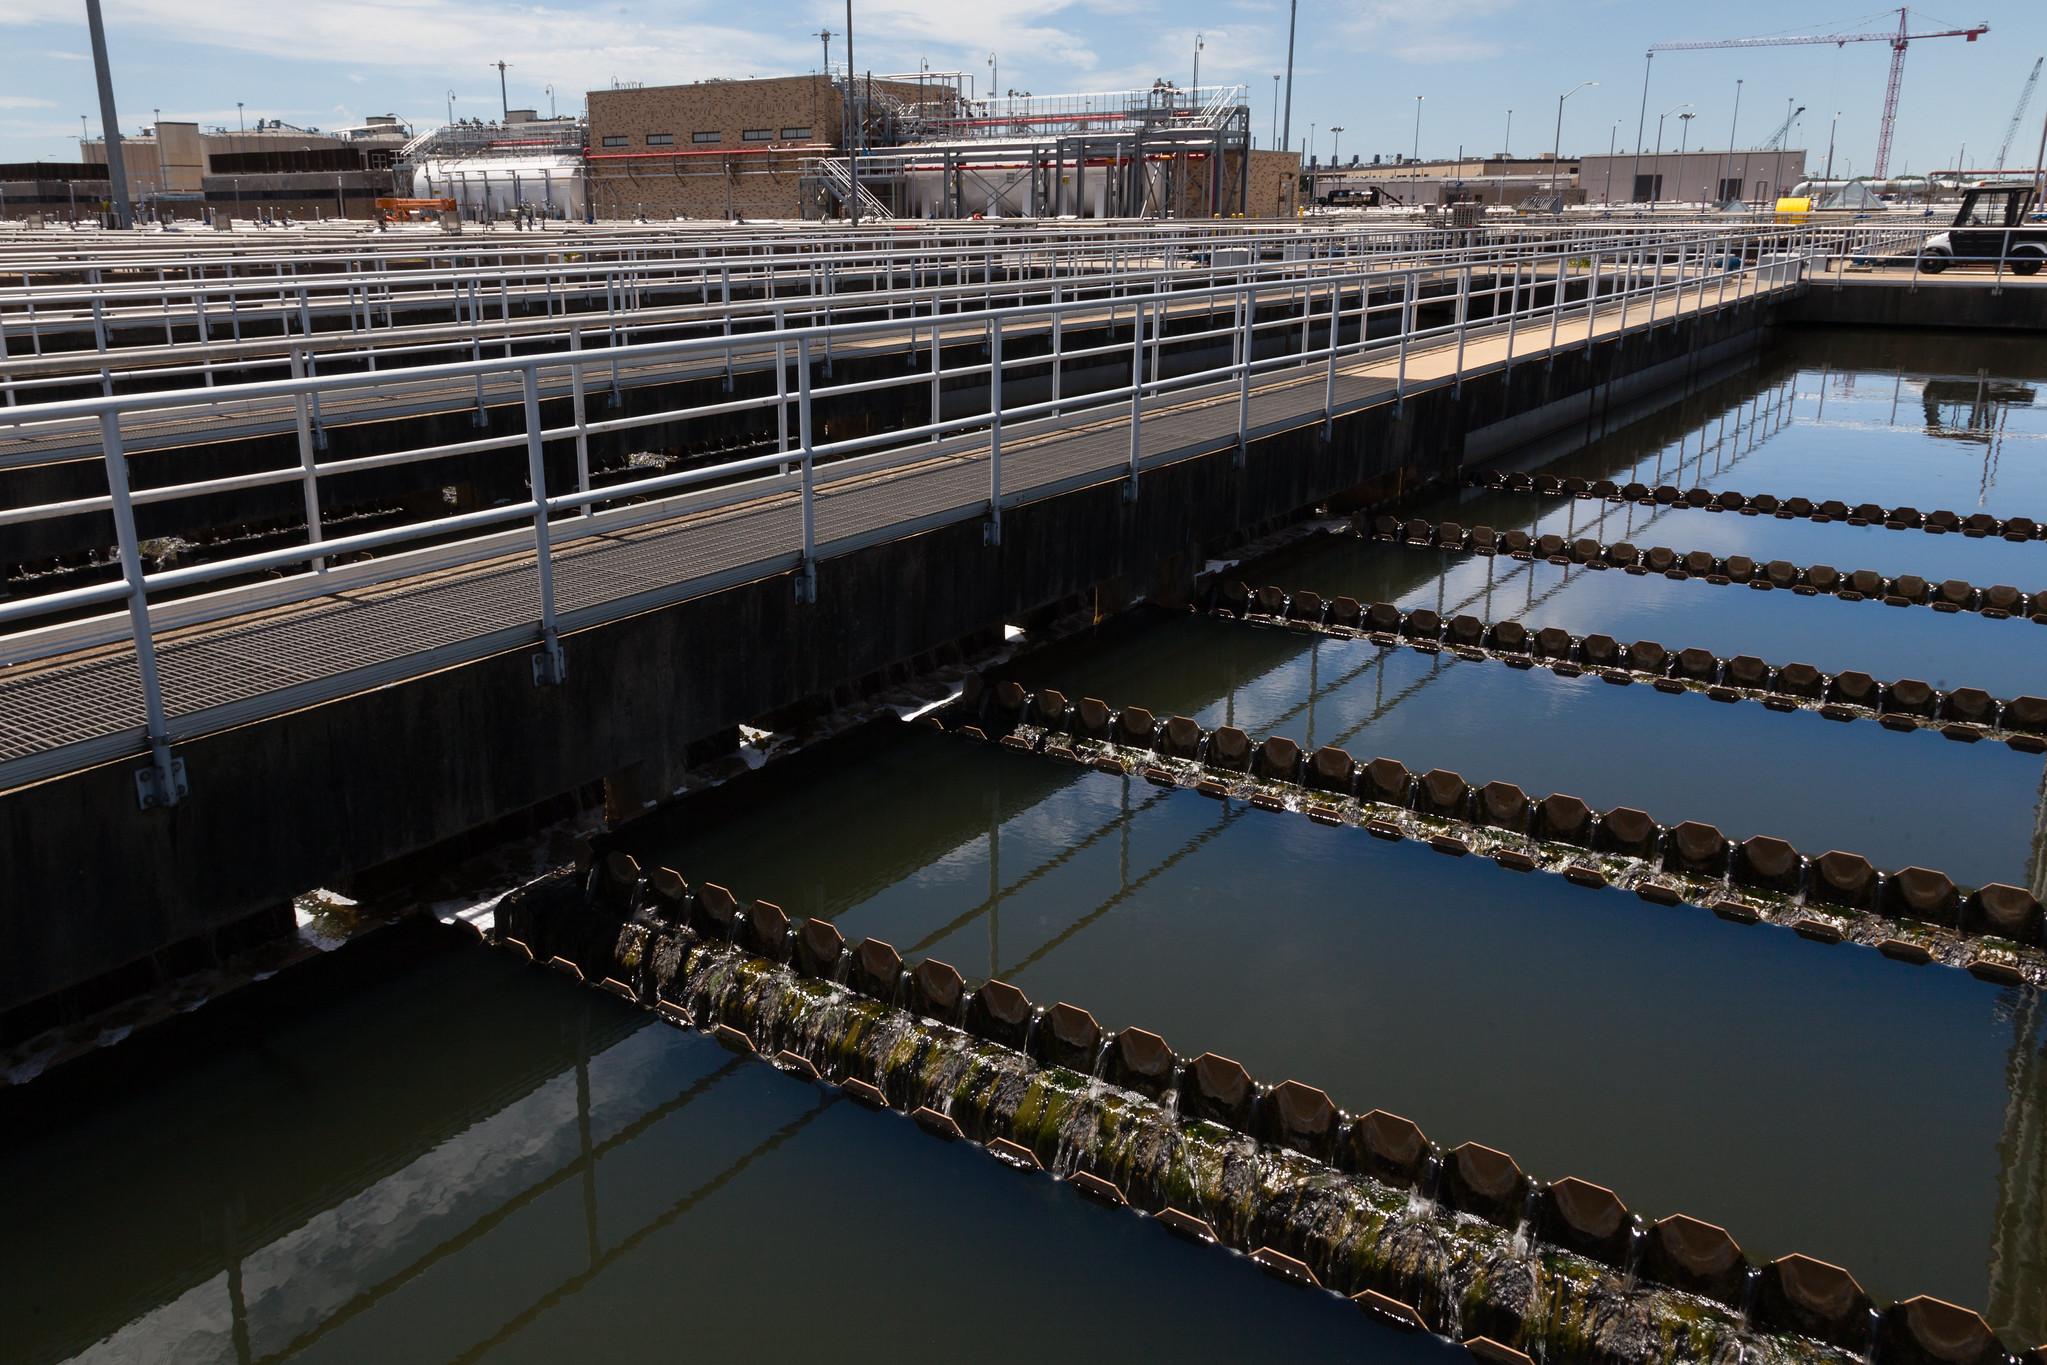 Planta de tratamiento de aguas residuales Blue Plains en Washington, D.C